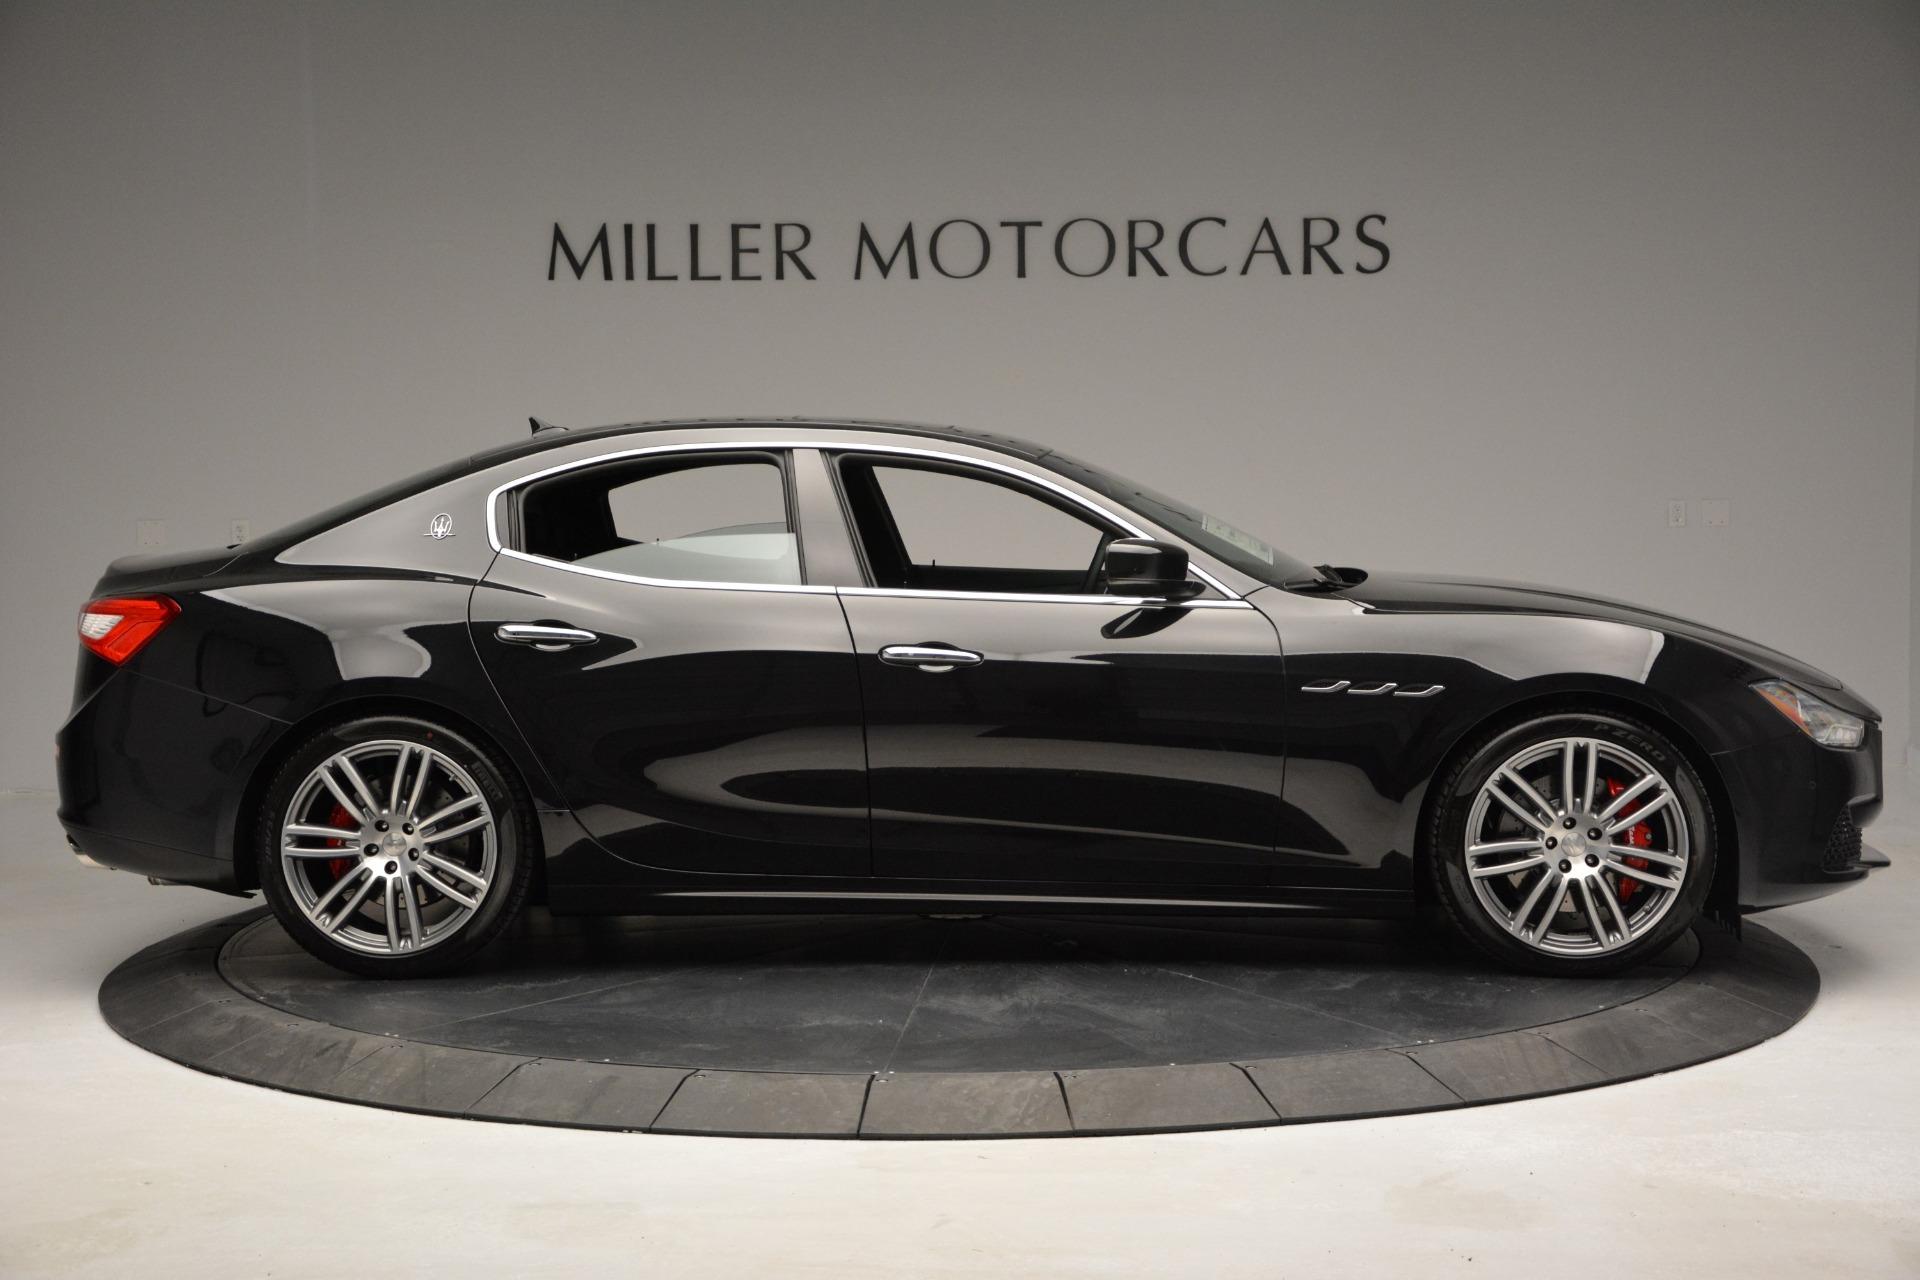 Used 2015 Maserati Ghibli S Q4 For Sale In Greenwich, CT. Alfa Romeo of Greenwich, 7325 2070_p9